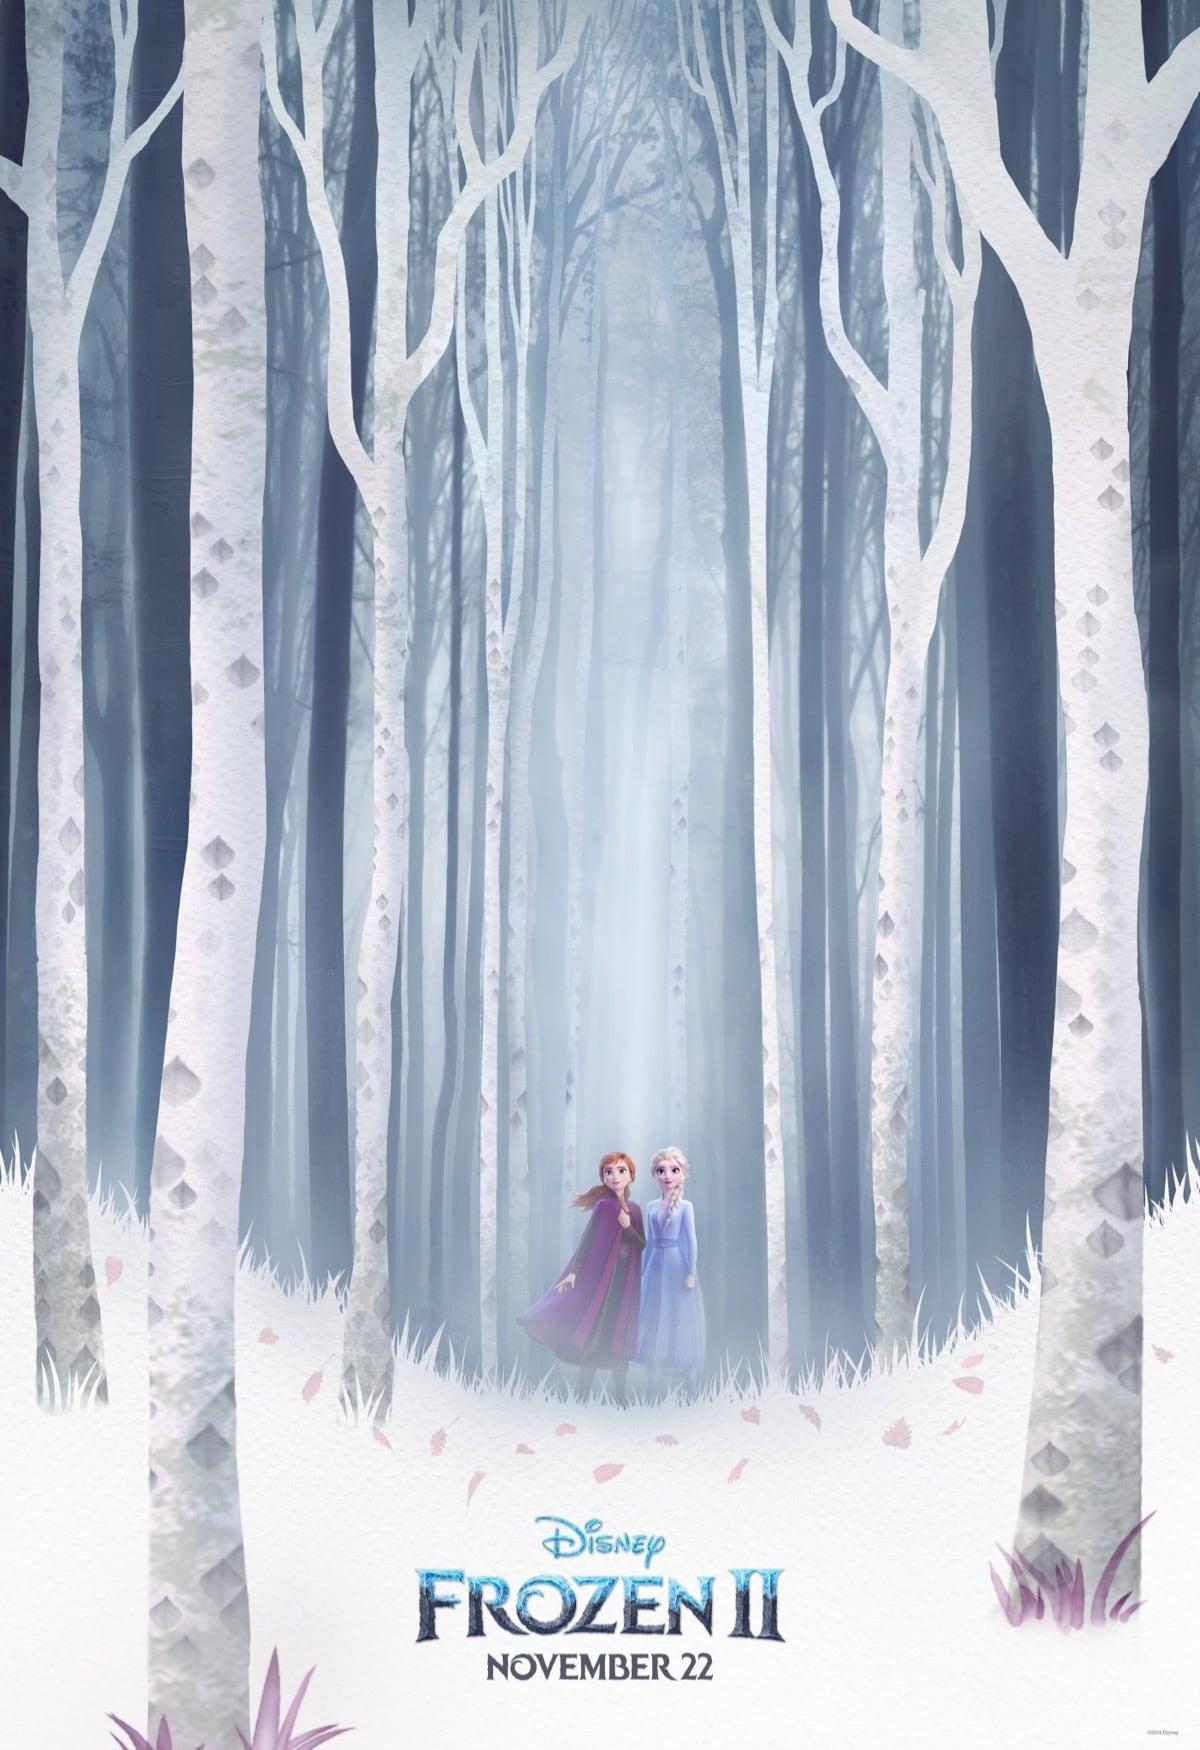 frozen 2 poster Frozen 2